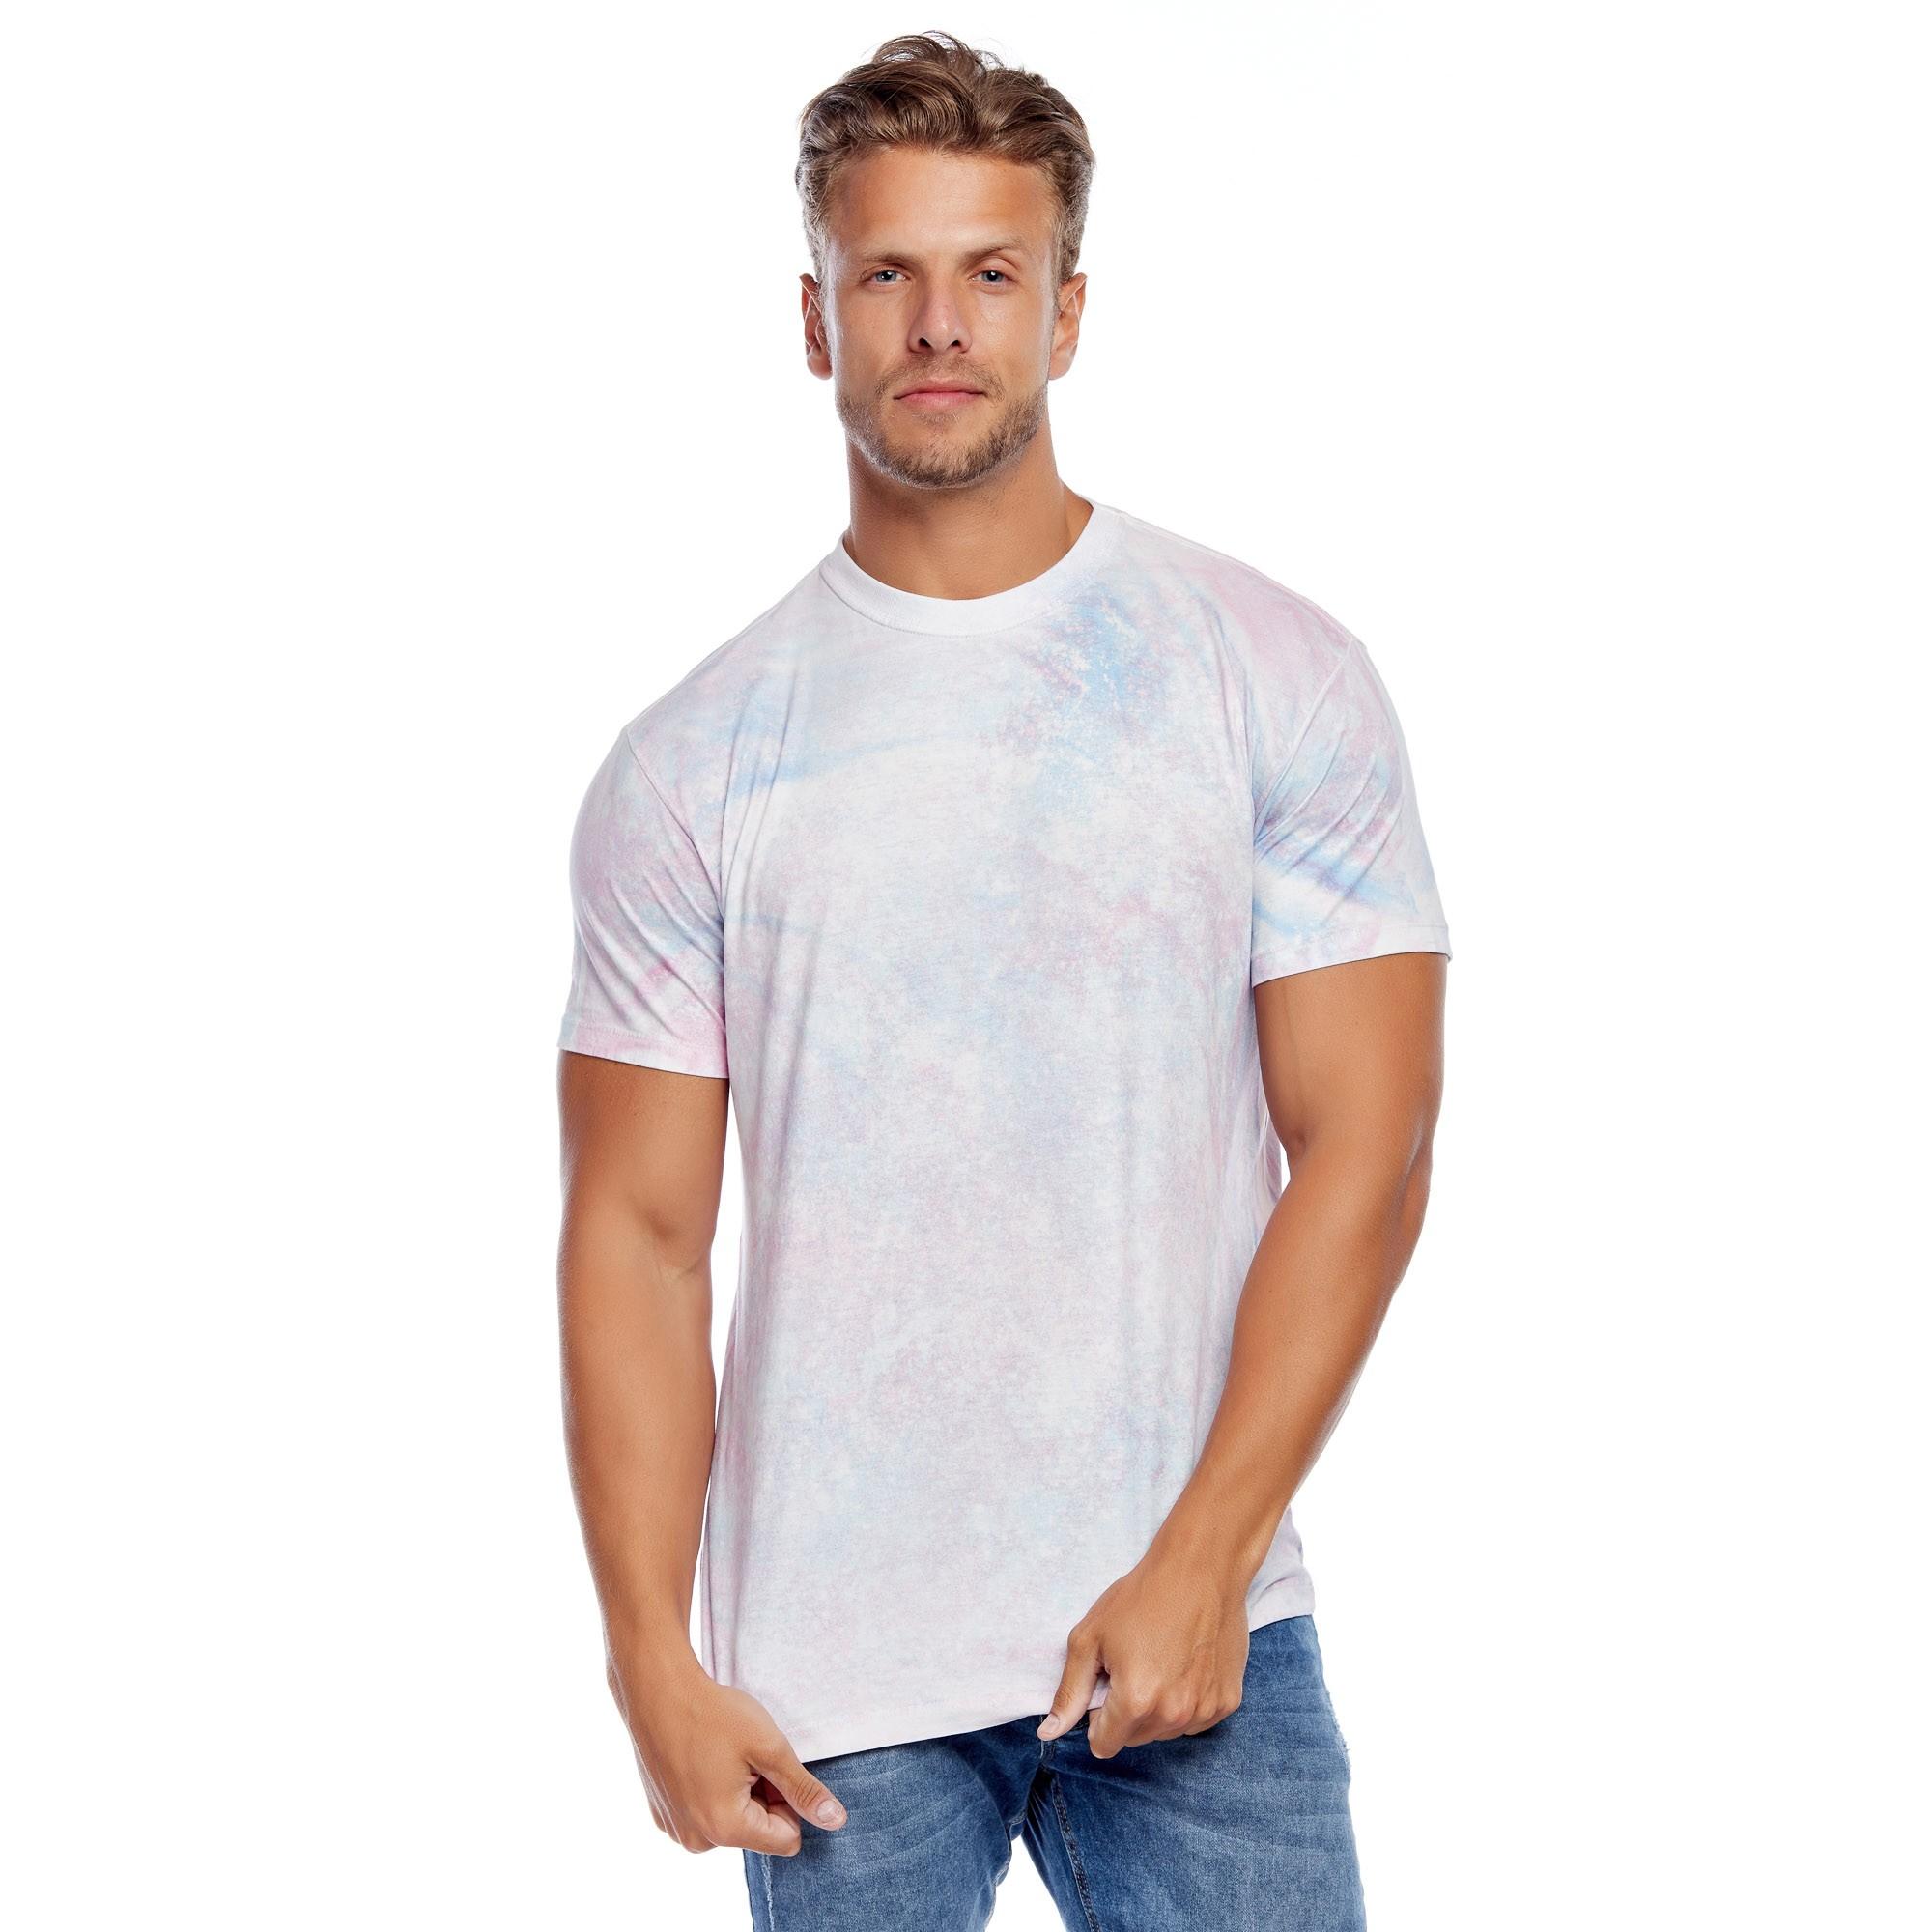 Camiseta Masculina Galaxy Total Evolvee